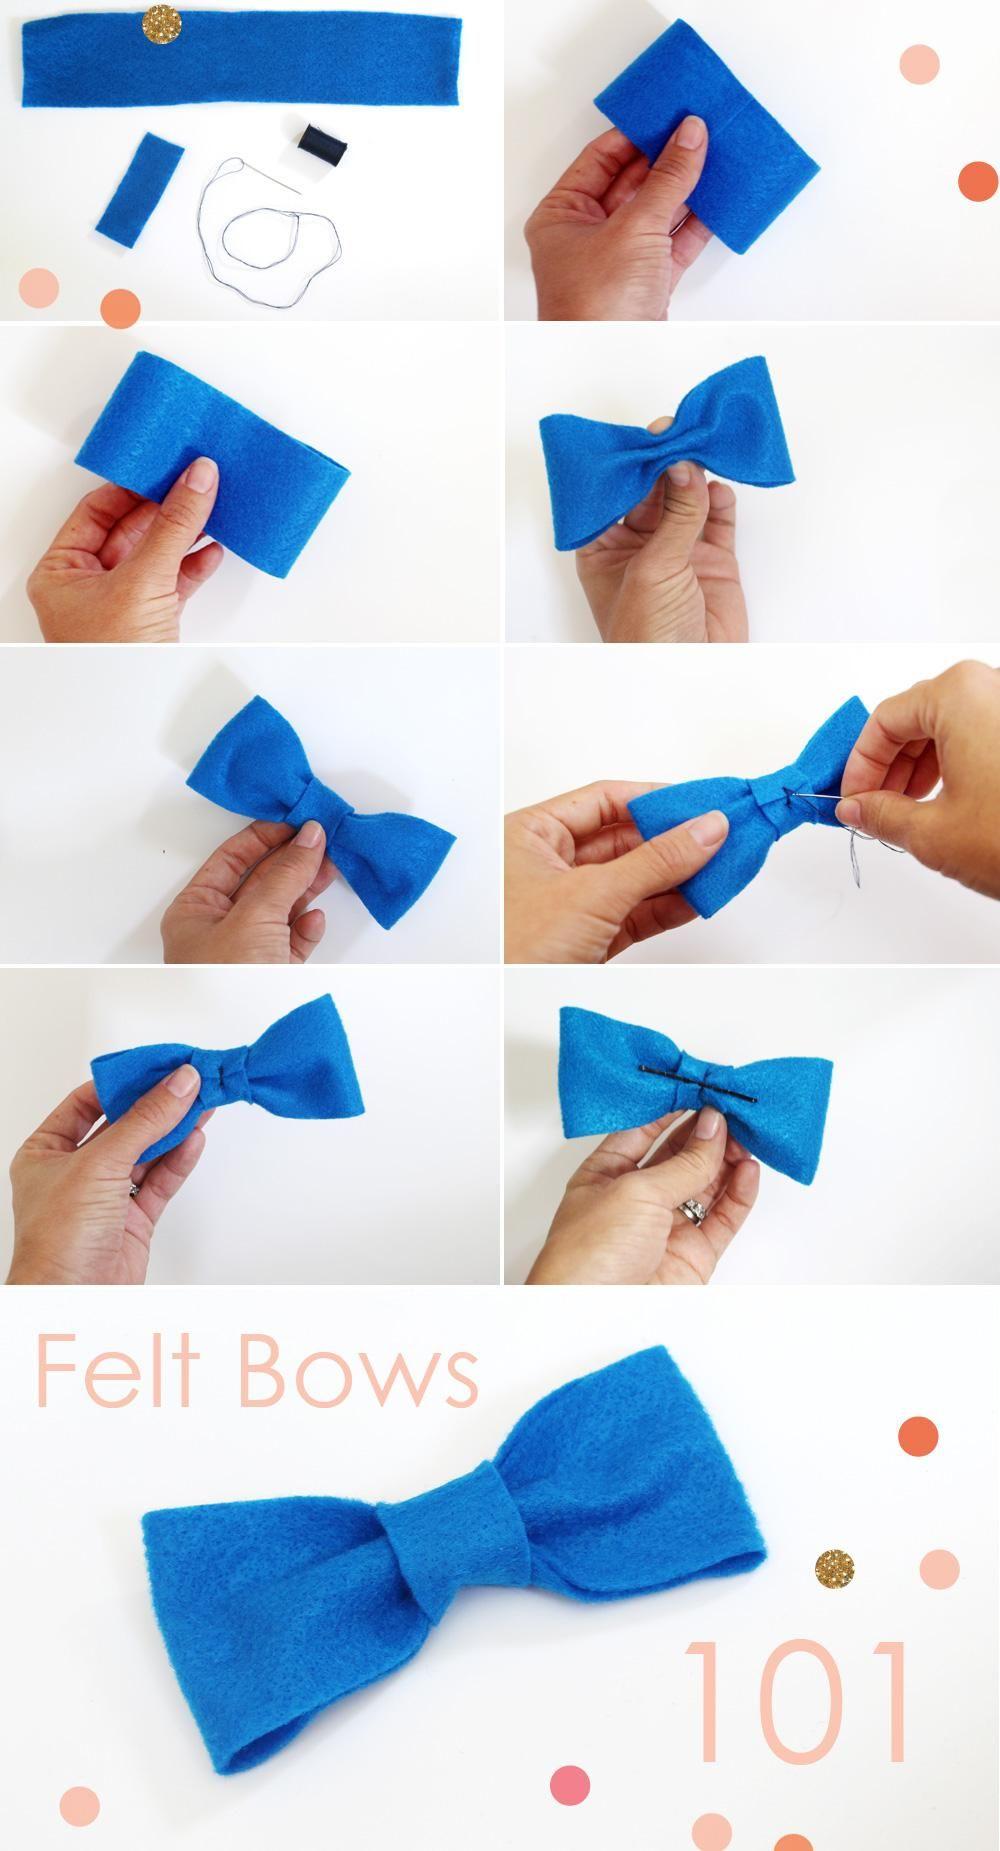 diy hair bows diy felt bows and bow ties baby pinterest halloween deguisement et. Black Bedroom Furniture Sets. Home Design Ideas